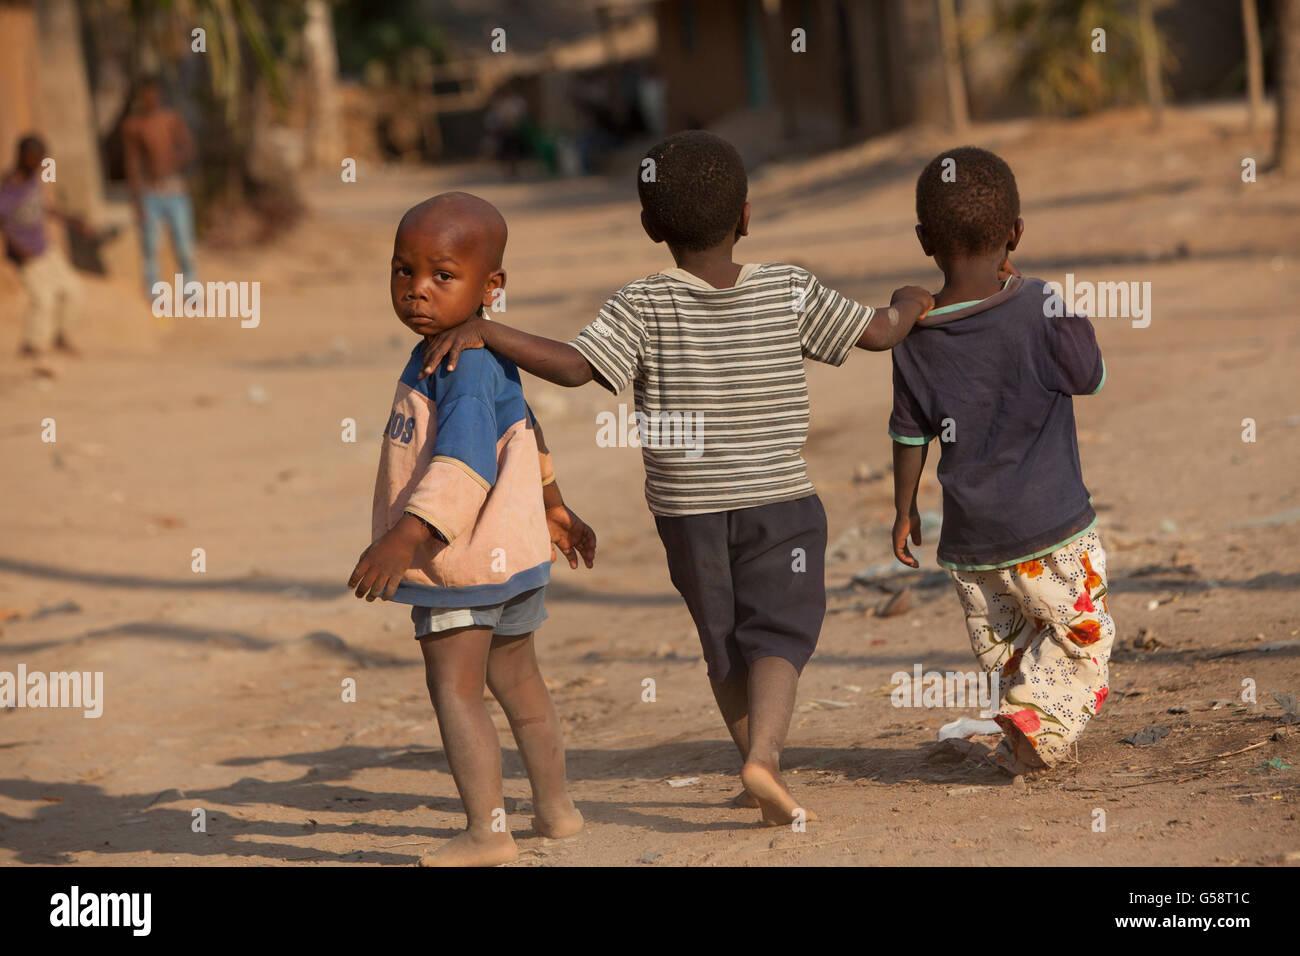 Los niños caminan a través de un barrio suburbano de Nampula, Mozambique. Imagen De Stock